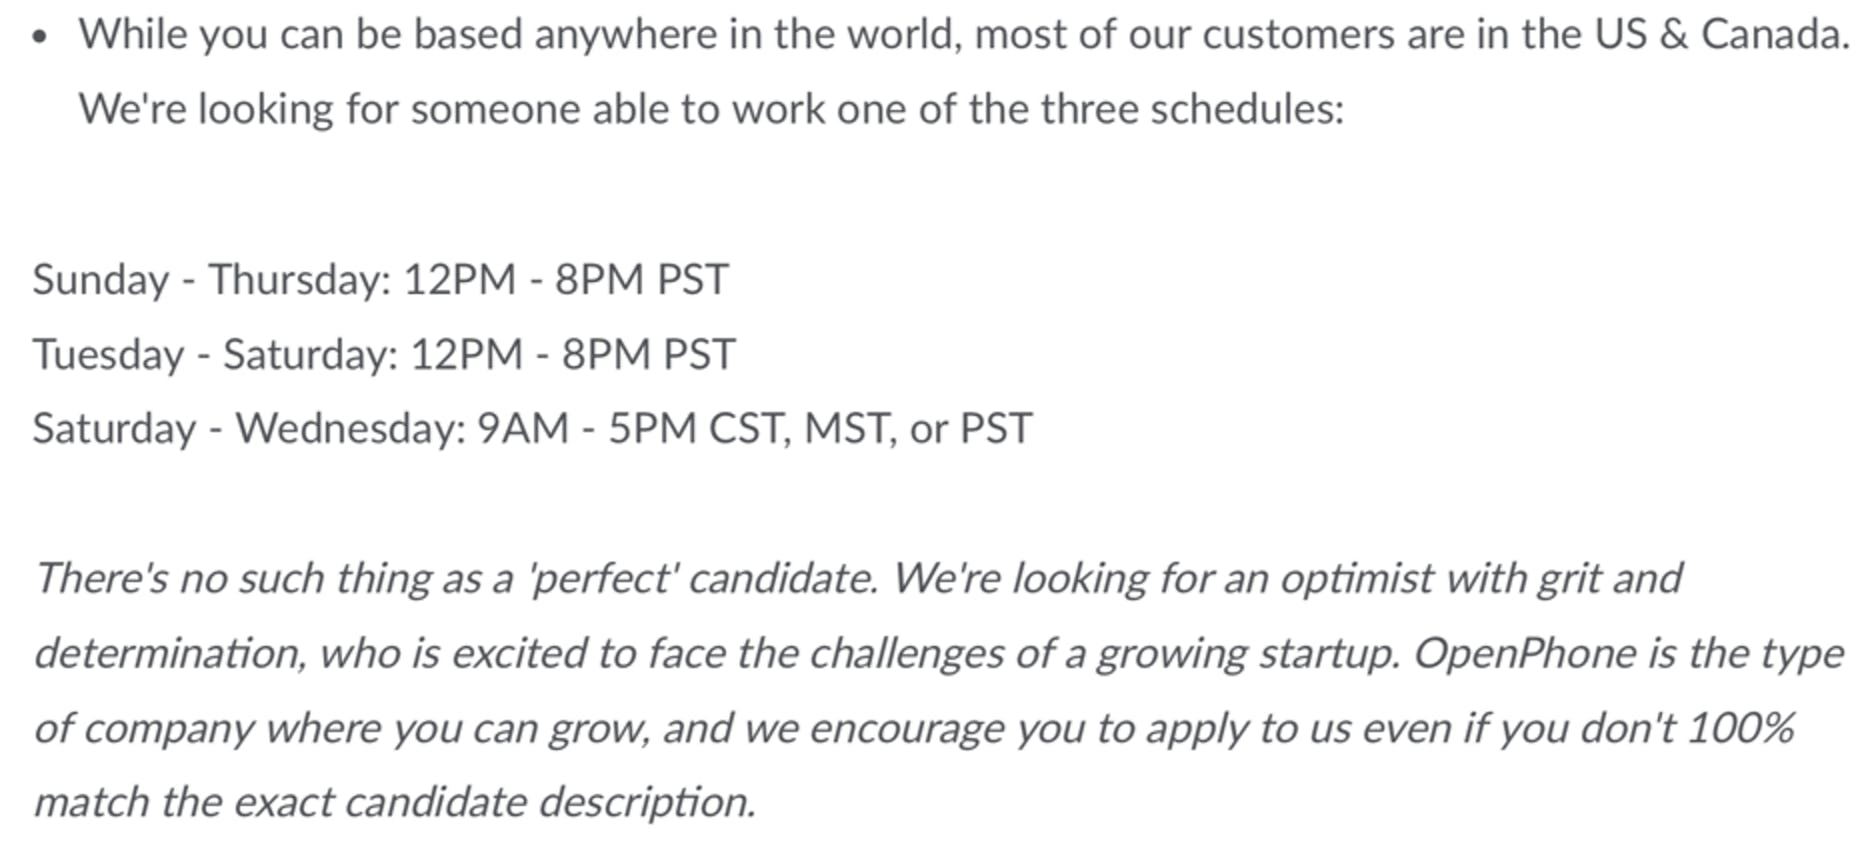 openphone customer support representative job description